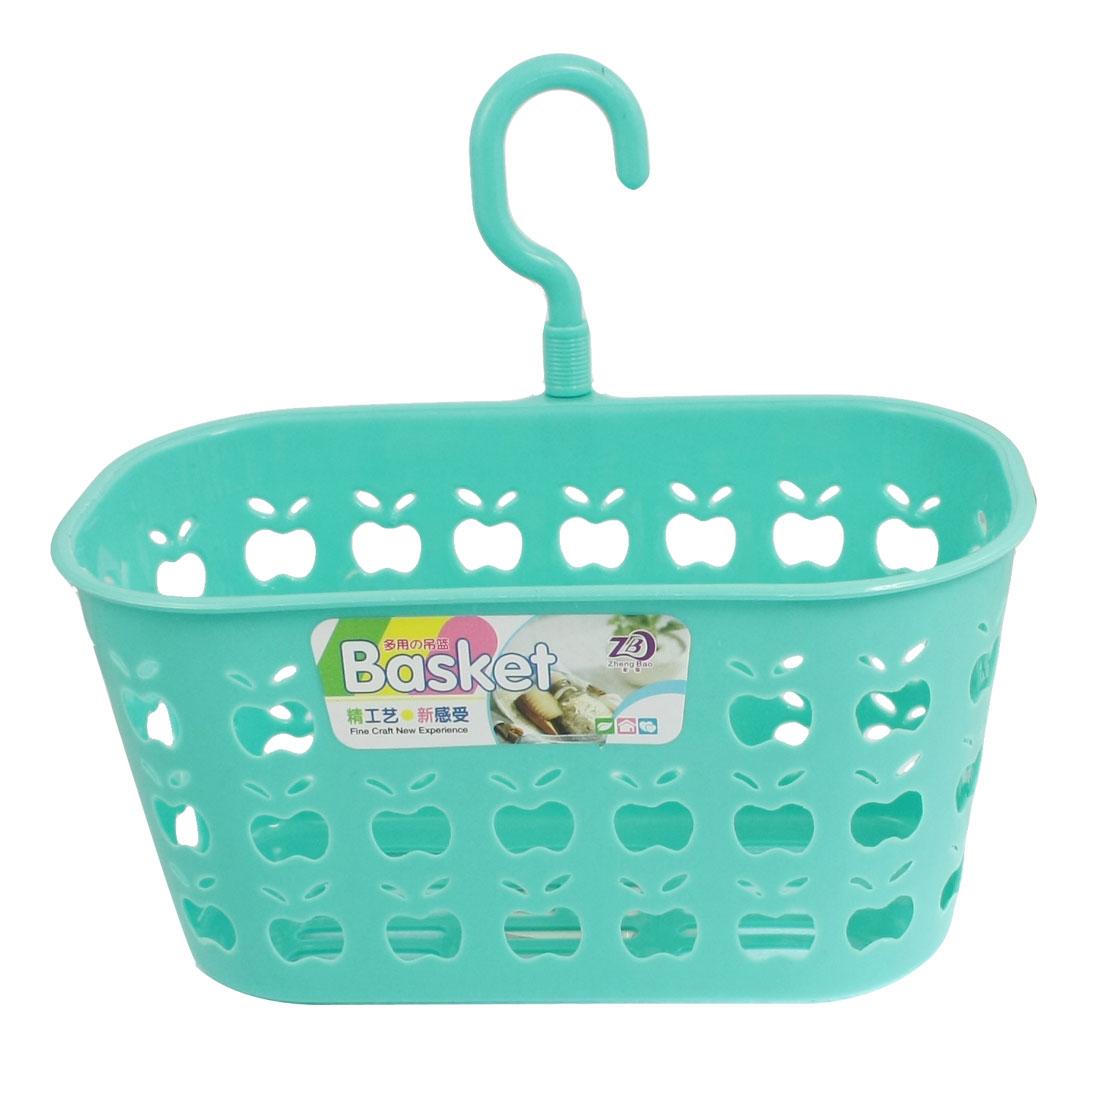 Bathroom Laundry Room Swivel Hook Perforated Plastic Basket Holder Cyan Blue